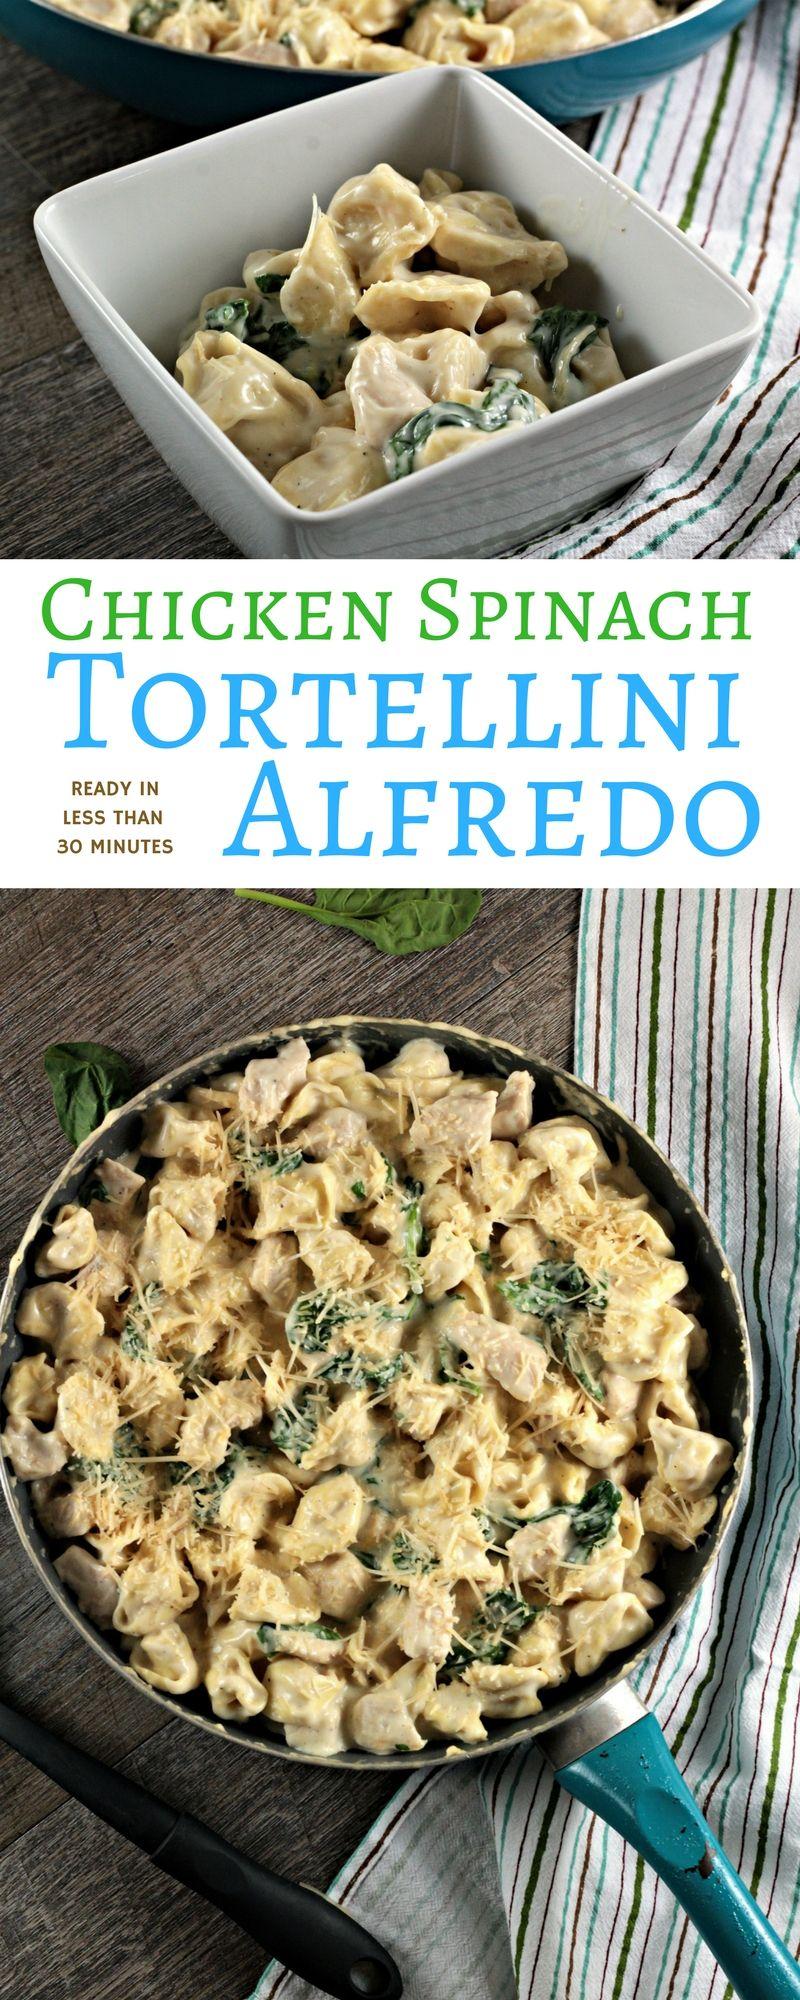 Chicken spinach tortellini alfredo recipe spinach